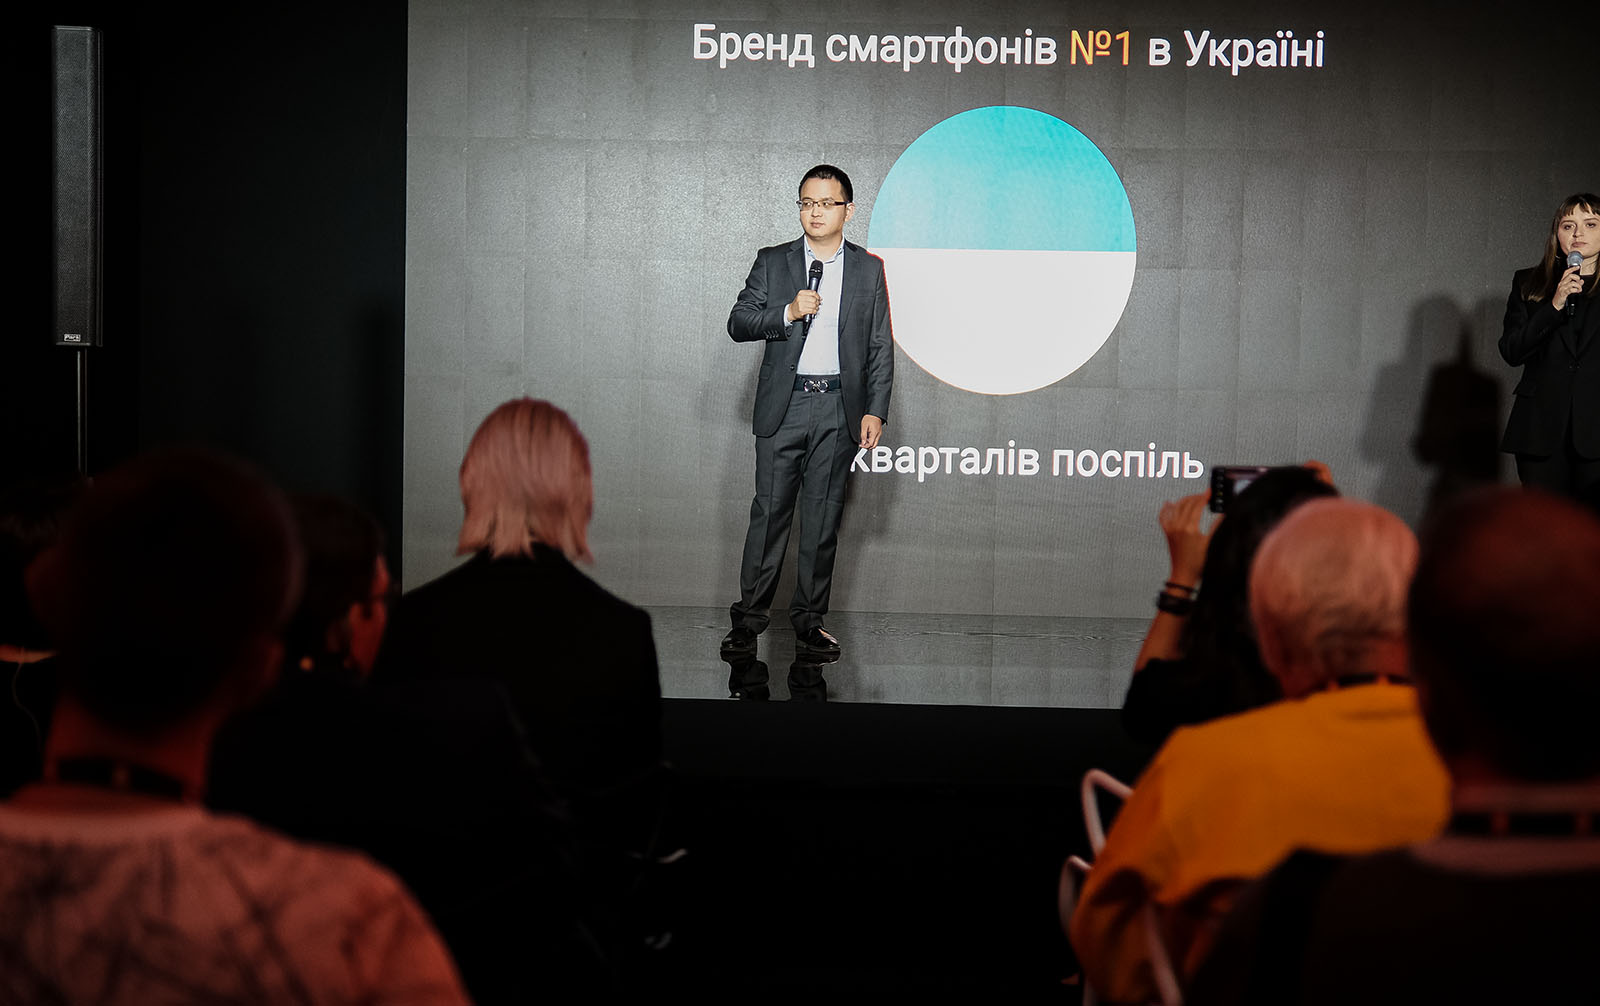 Новинки Xiaomi в Украине: смартфоны Xiaomi 11T, 11T Pro, Lite 5G NE, планшет Xiaomi Pad 5